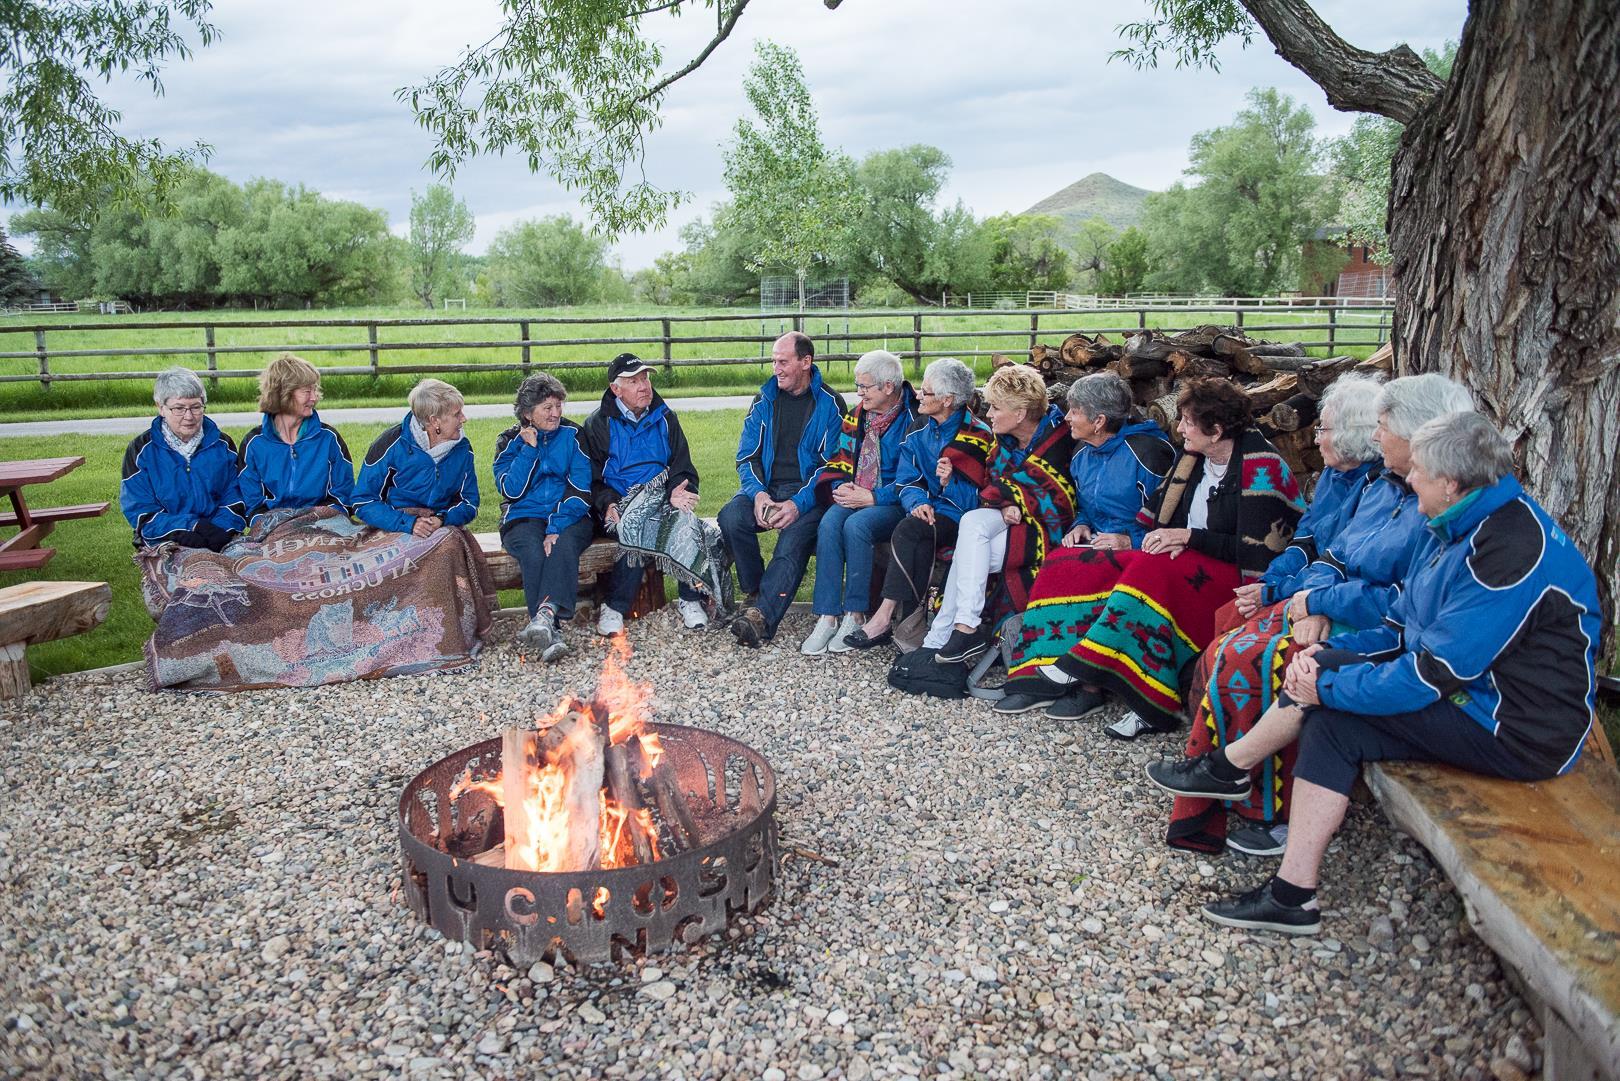 Campfire Sing-a-long